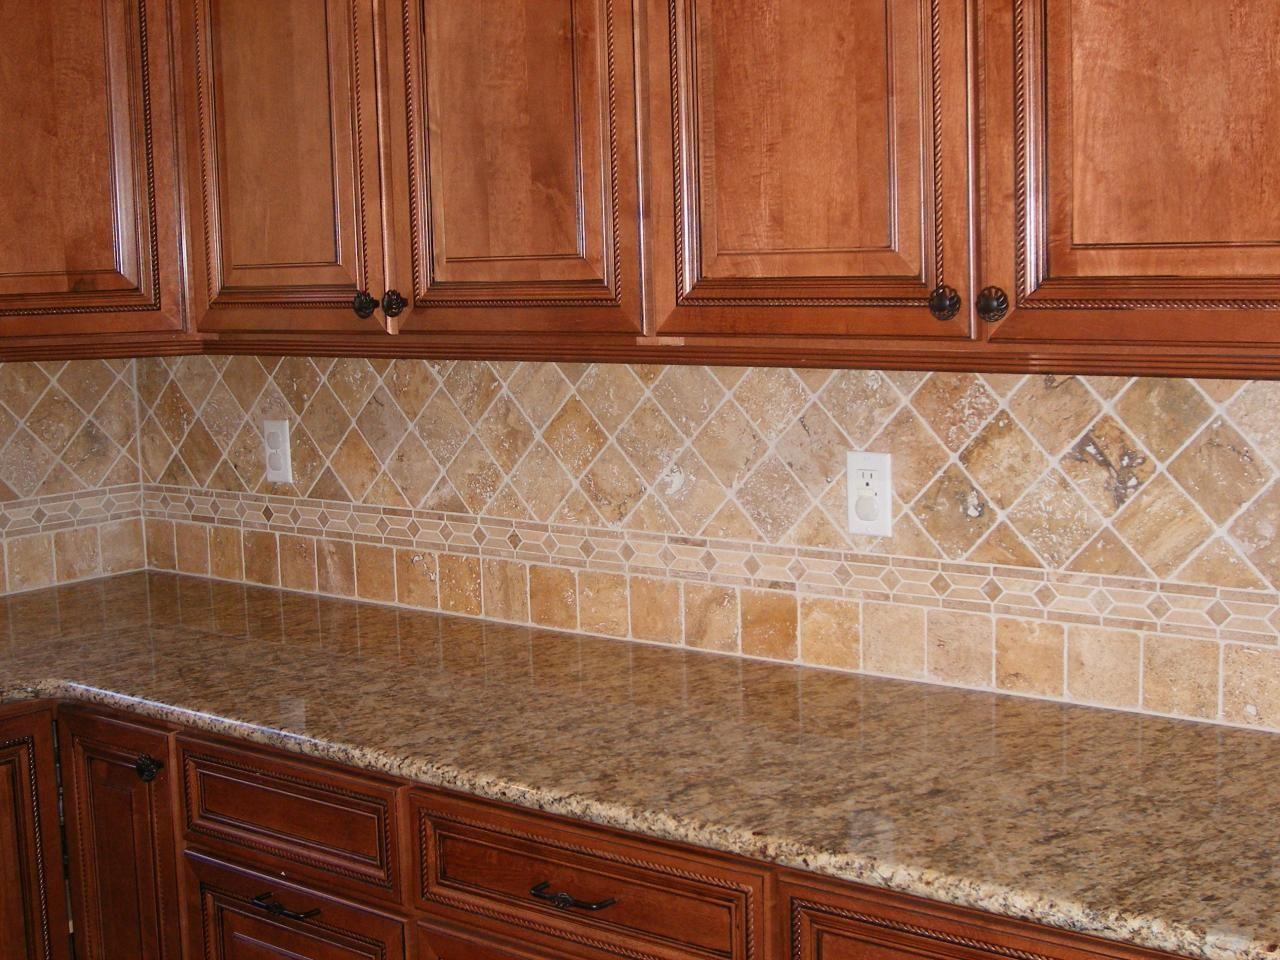 Travertine backsplash kitchen stuff pinterest travertine